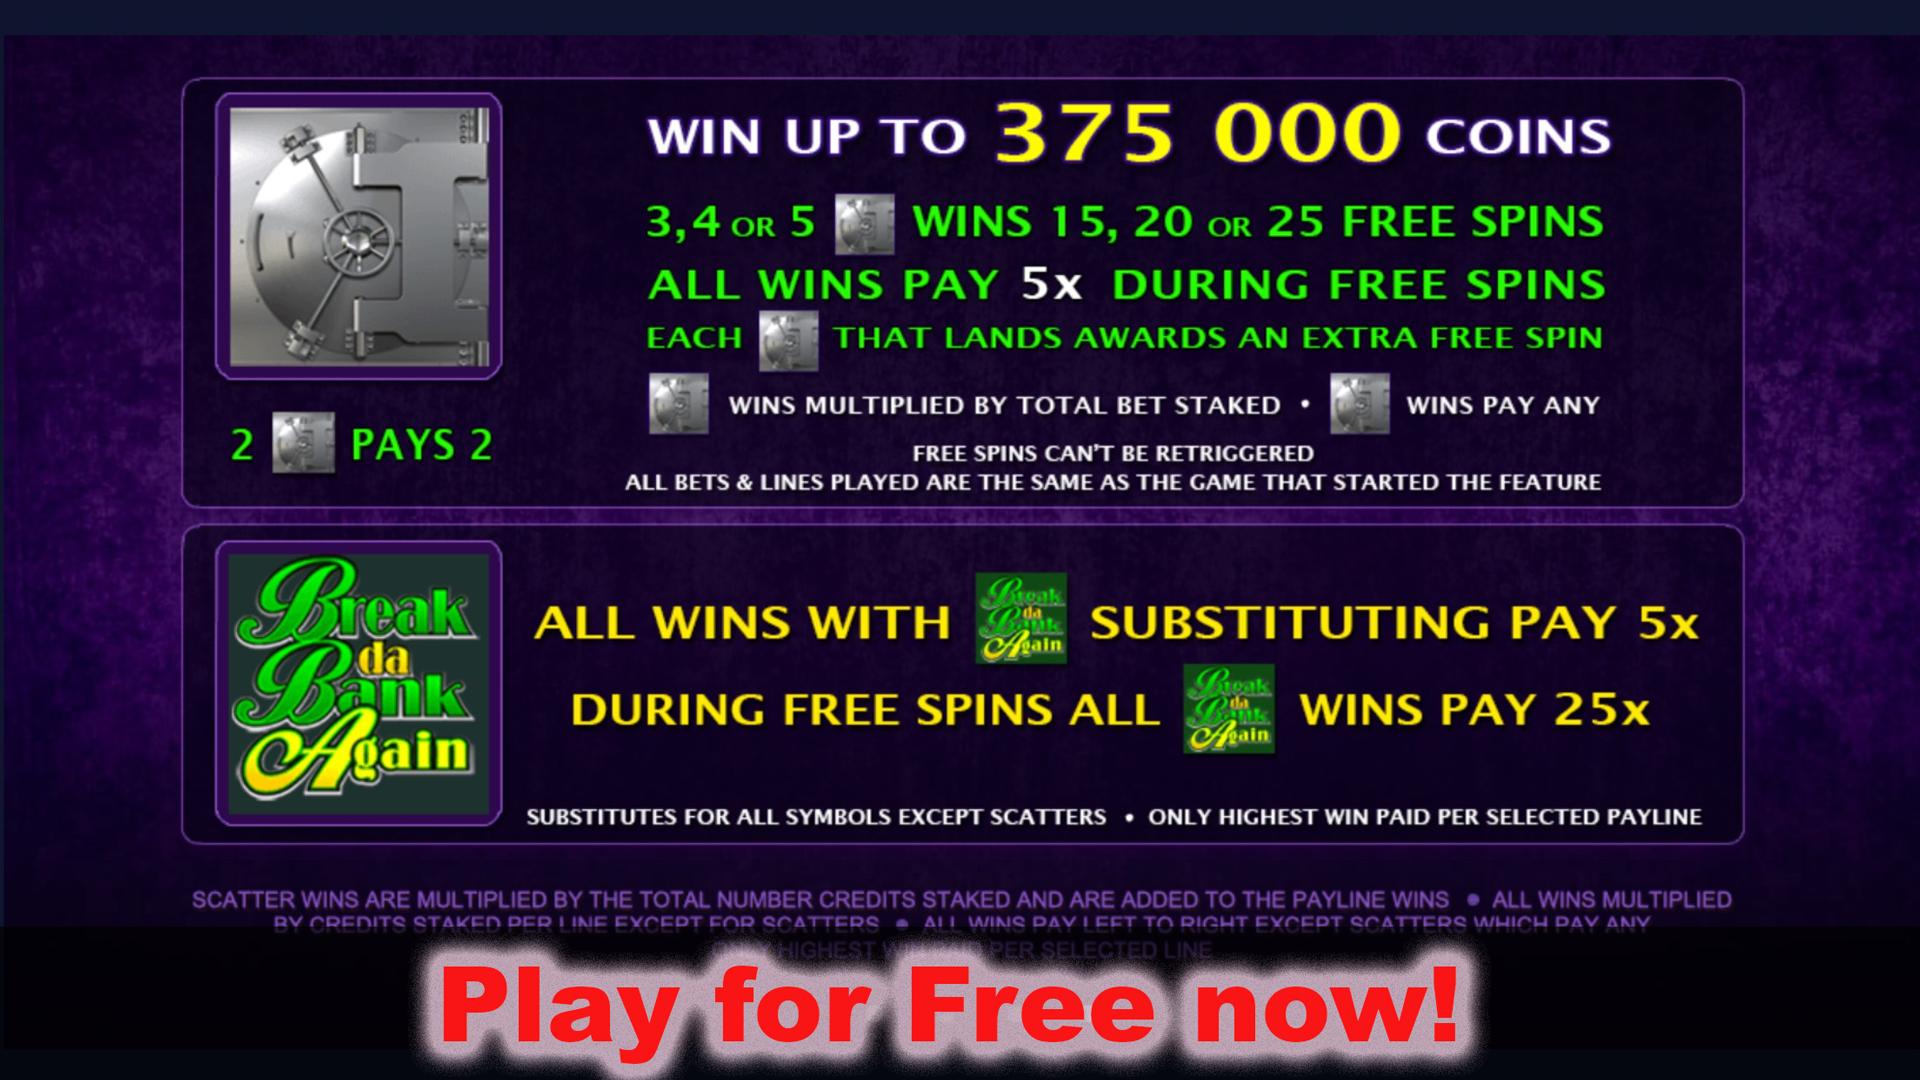 Break da Bank Again Video Slot – Free Online Casino Game